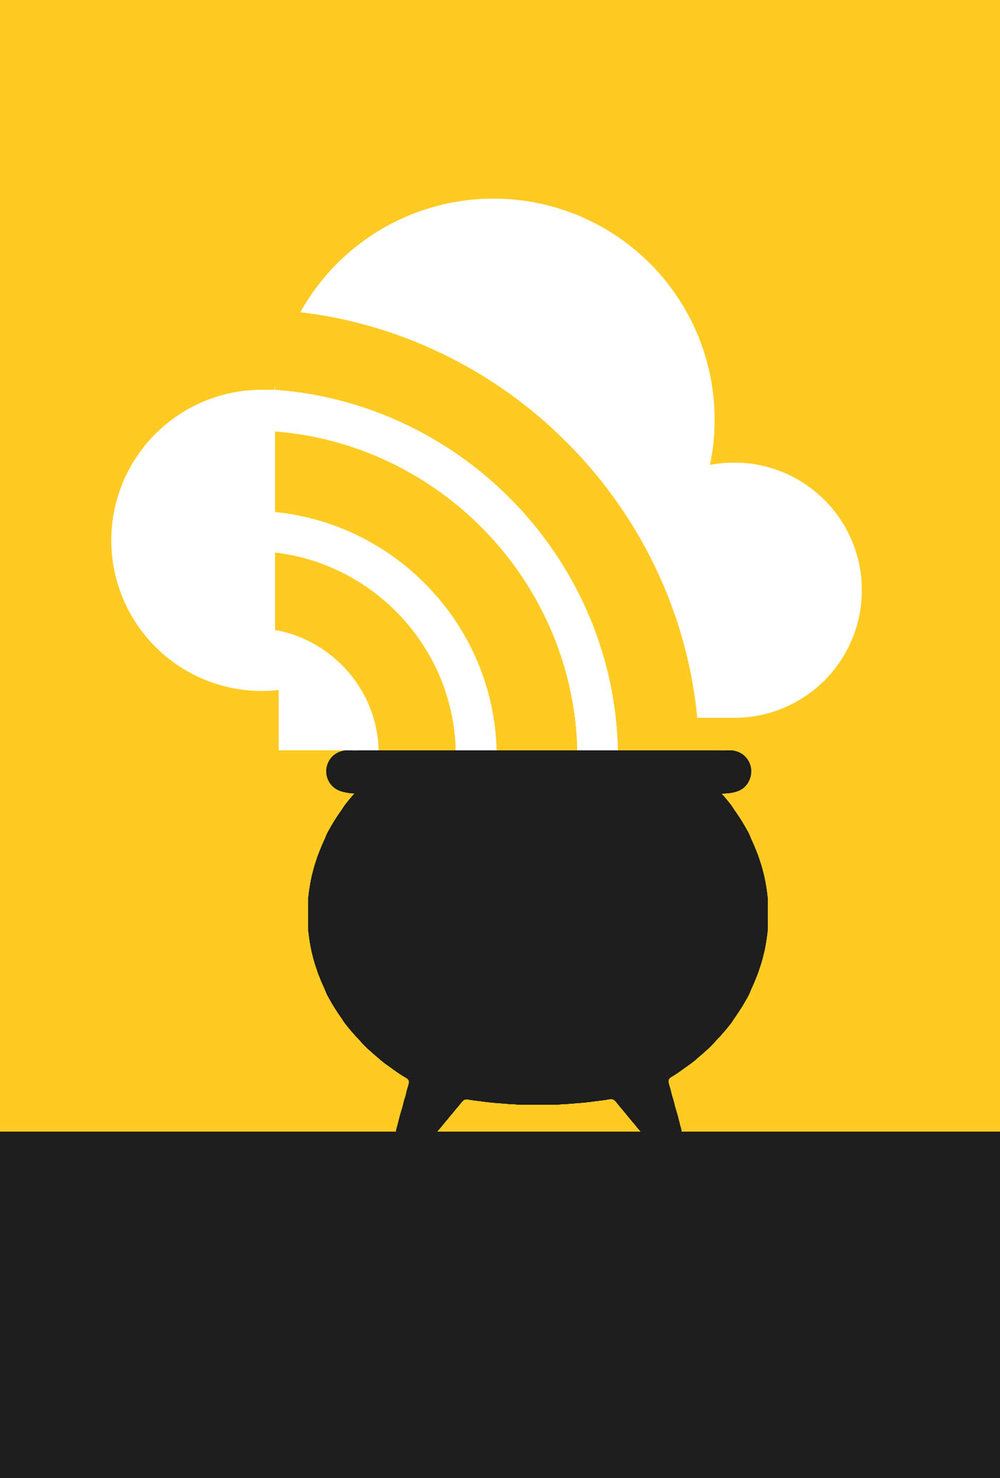 Tribune - The myth of tech companies making fast money.